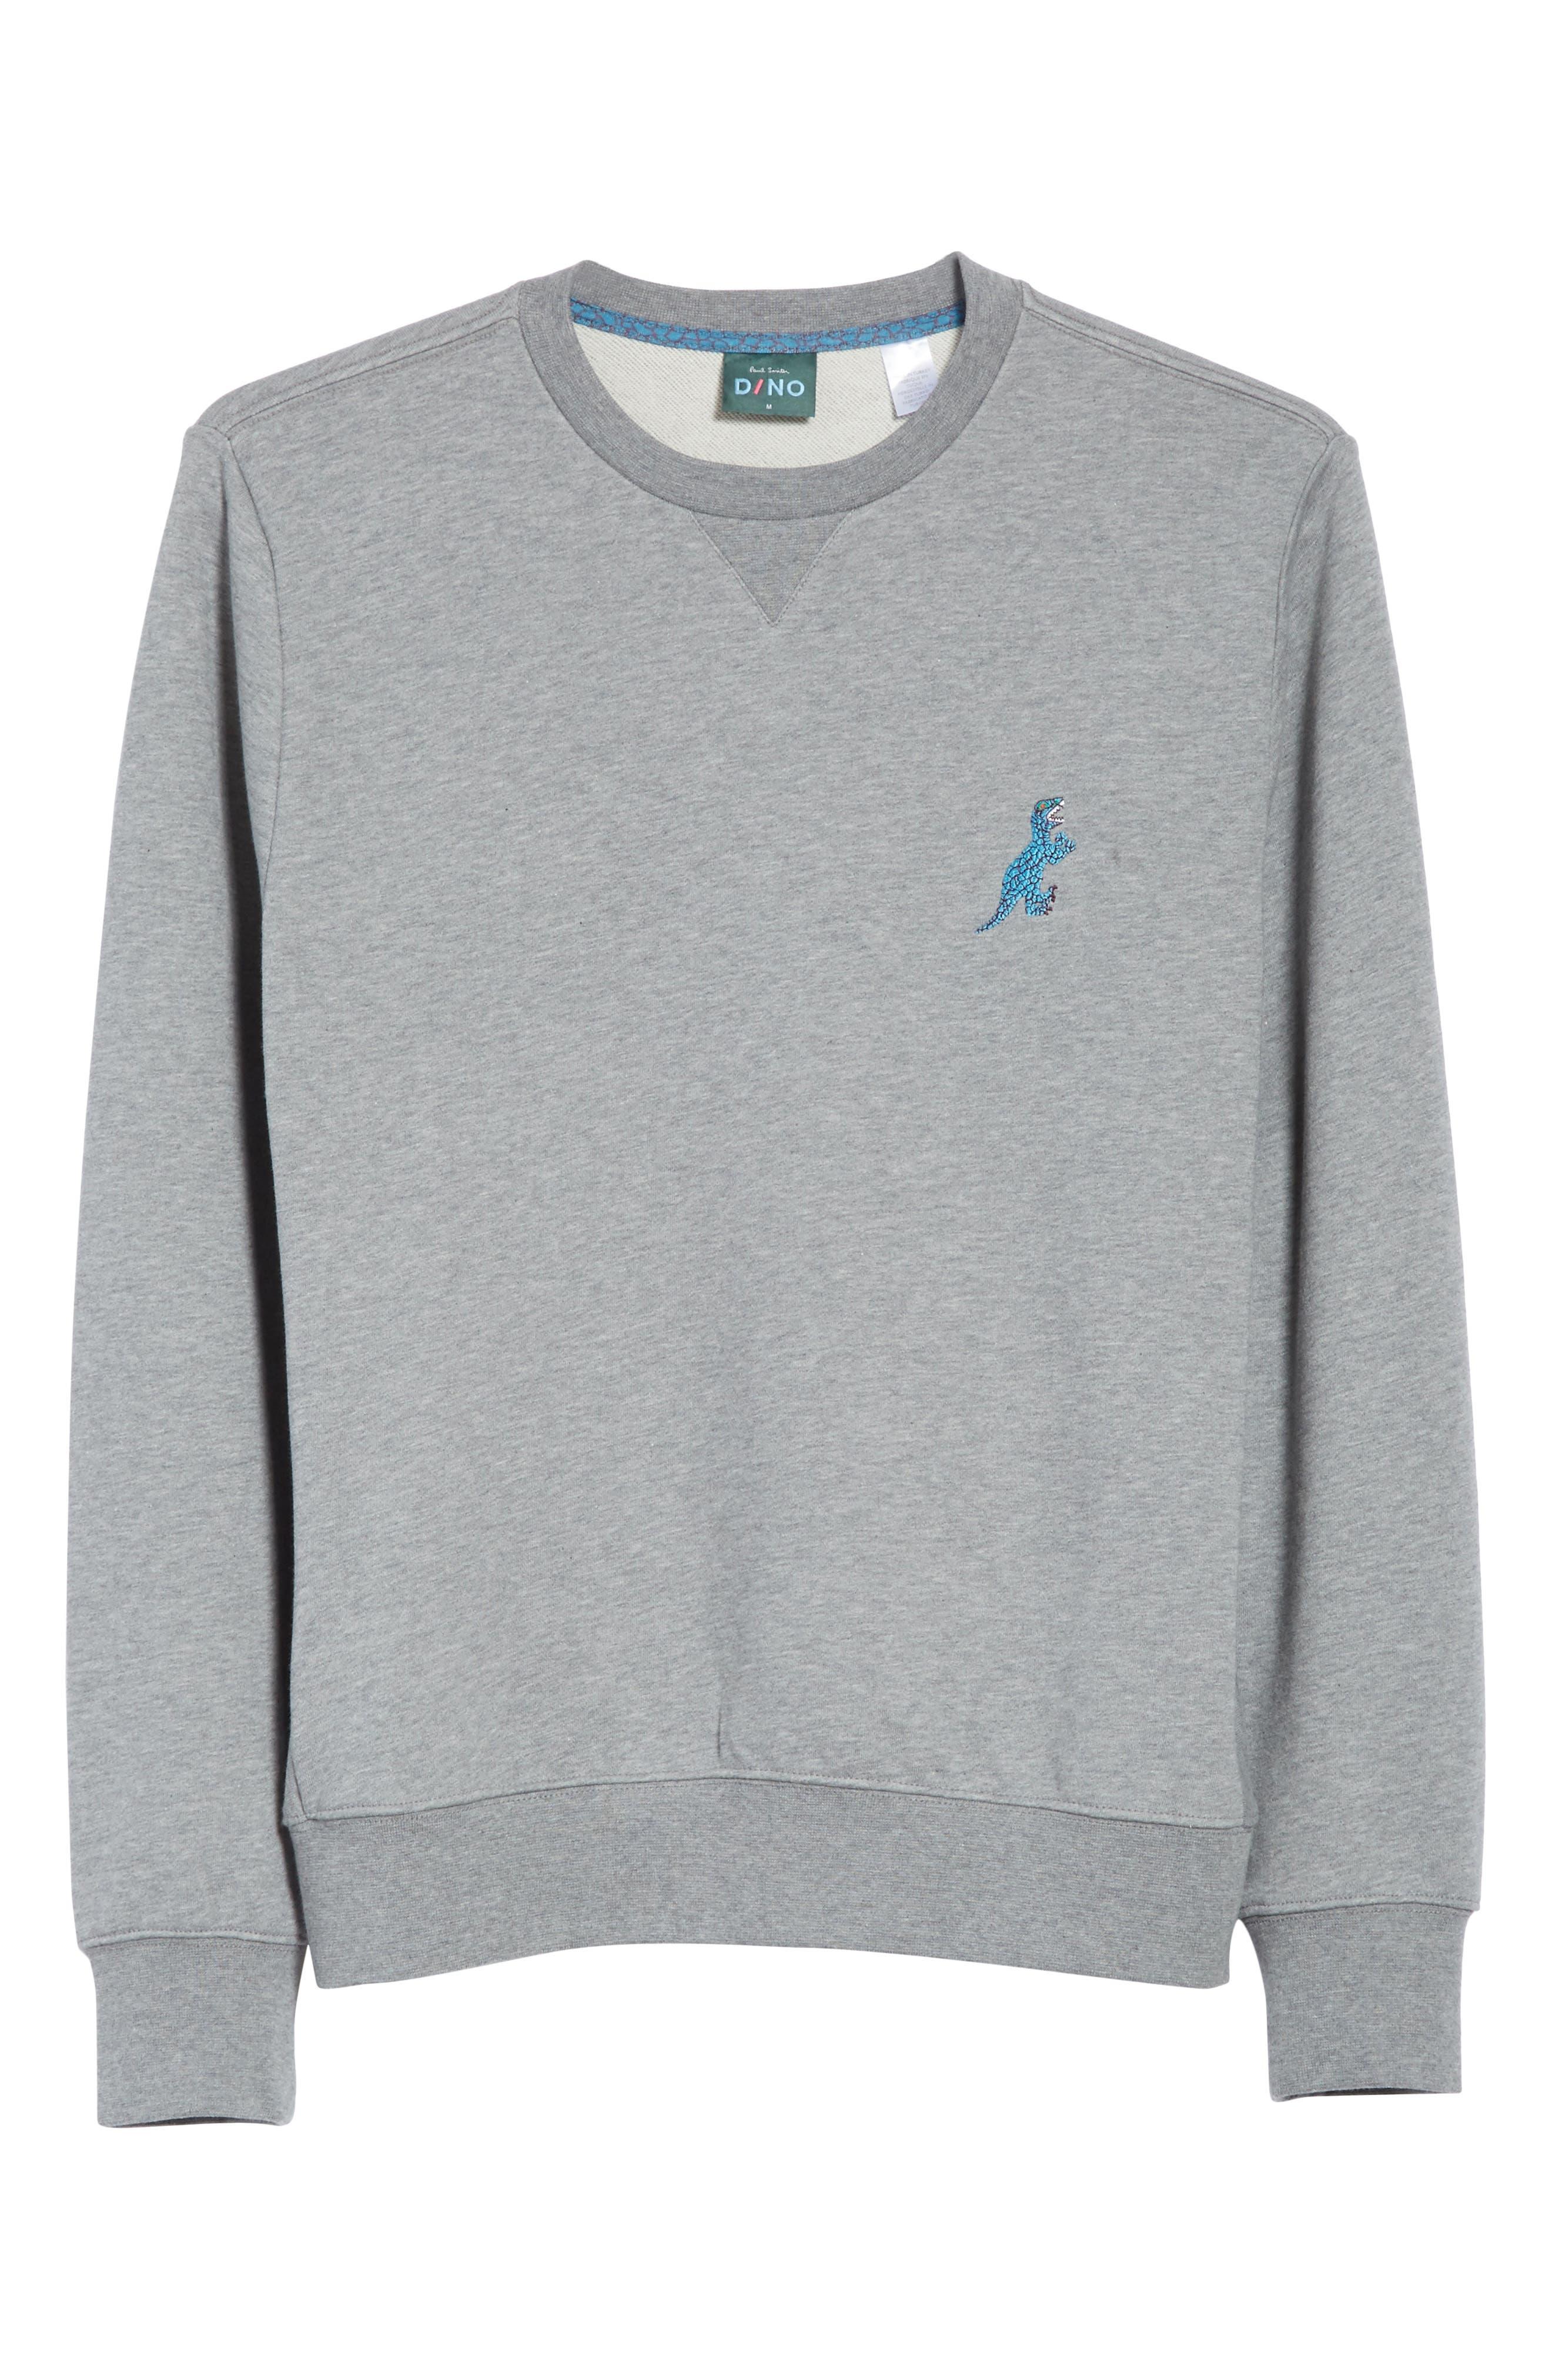 Dino Embroidered Crewneck Sweatshirt,                             Alternate thumbnail 6, color,